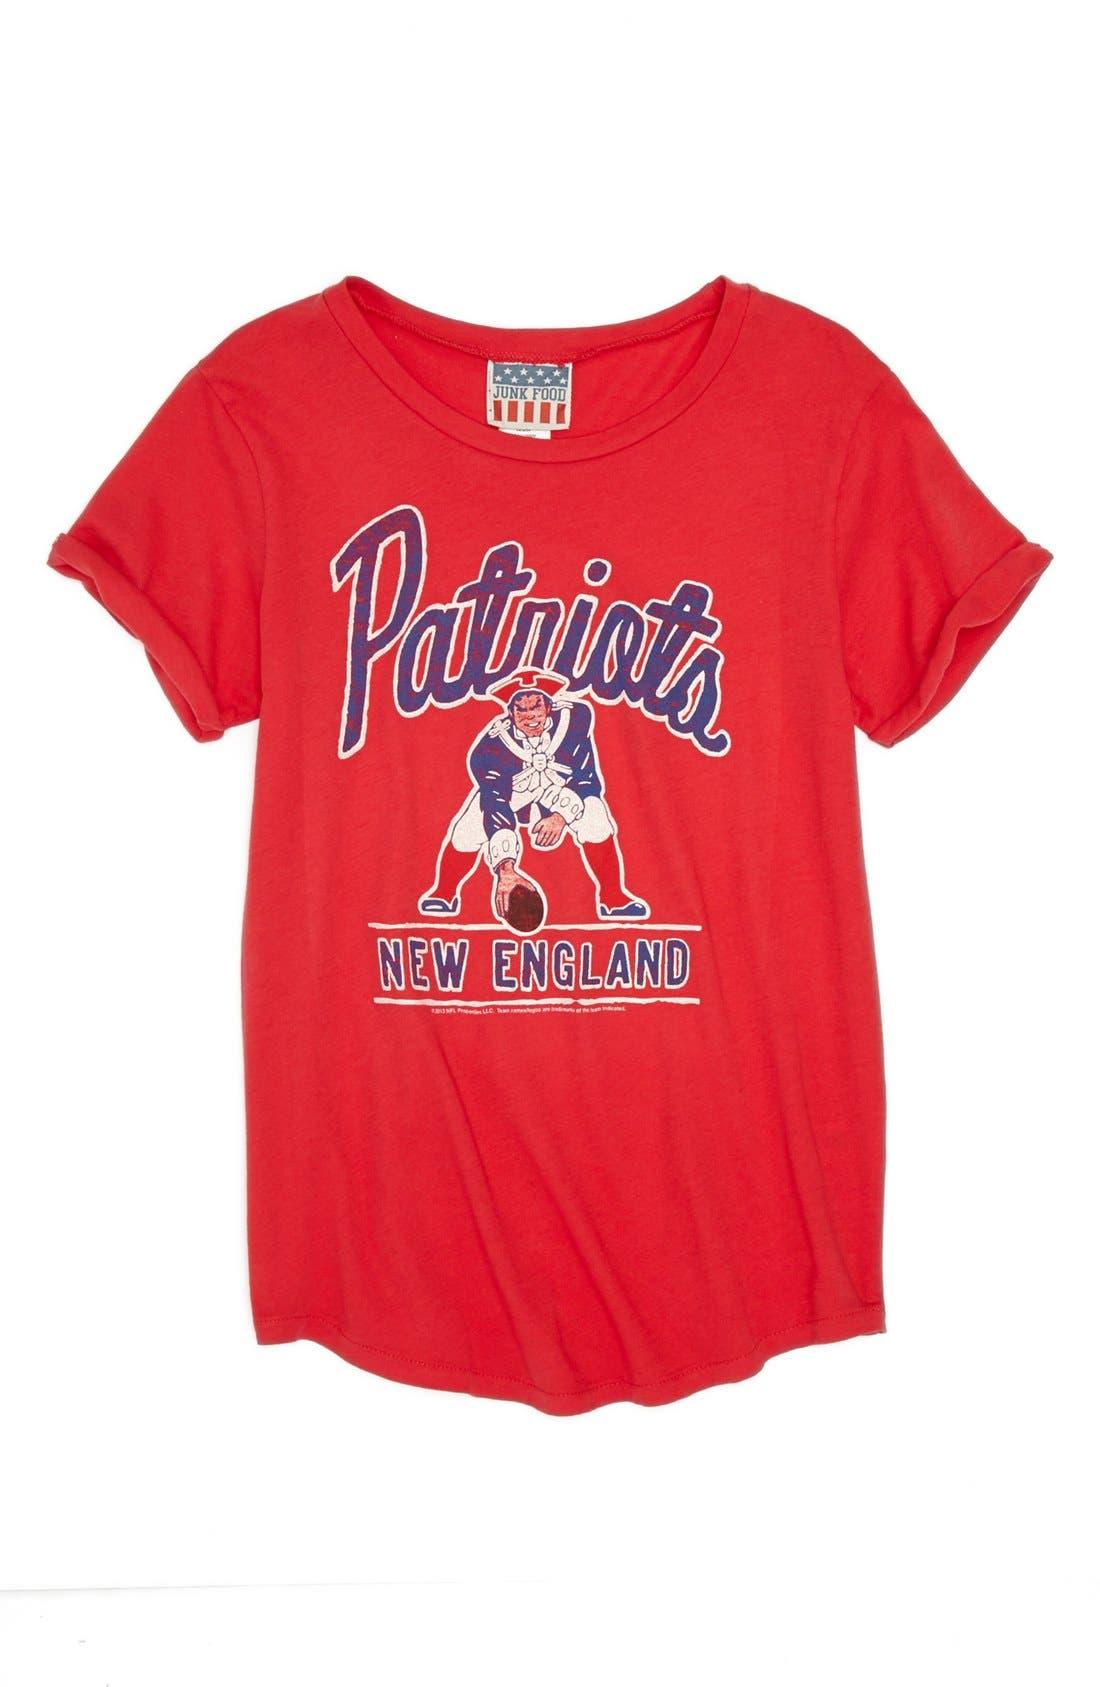 Alternate Image 1 Selected - Junk Food 'NFL - New England Patriots' Tee (Big Girls)